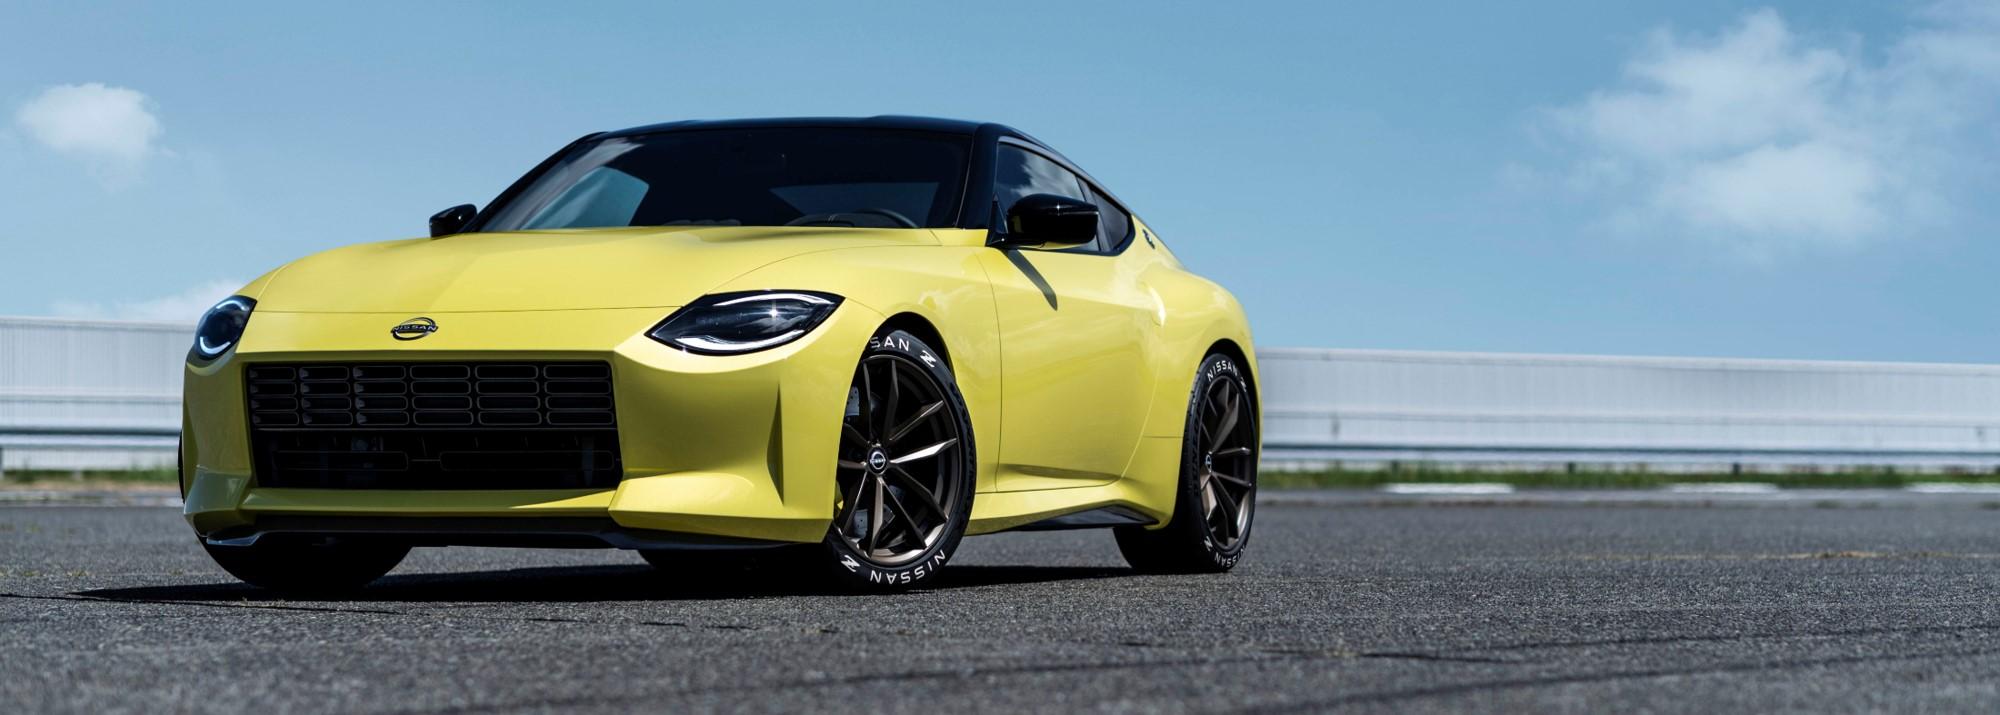 Nissan Proto Z unveiled